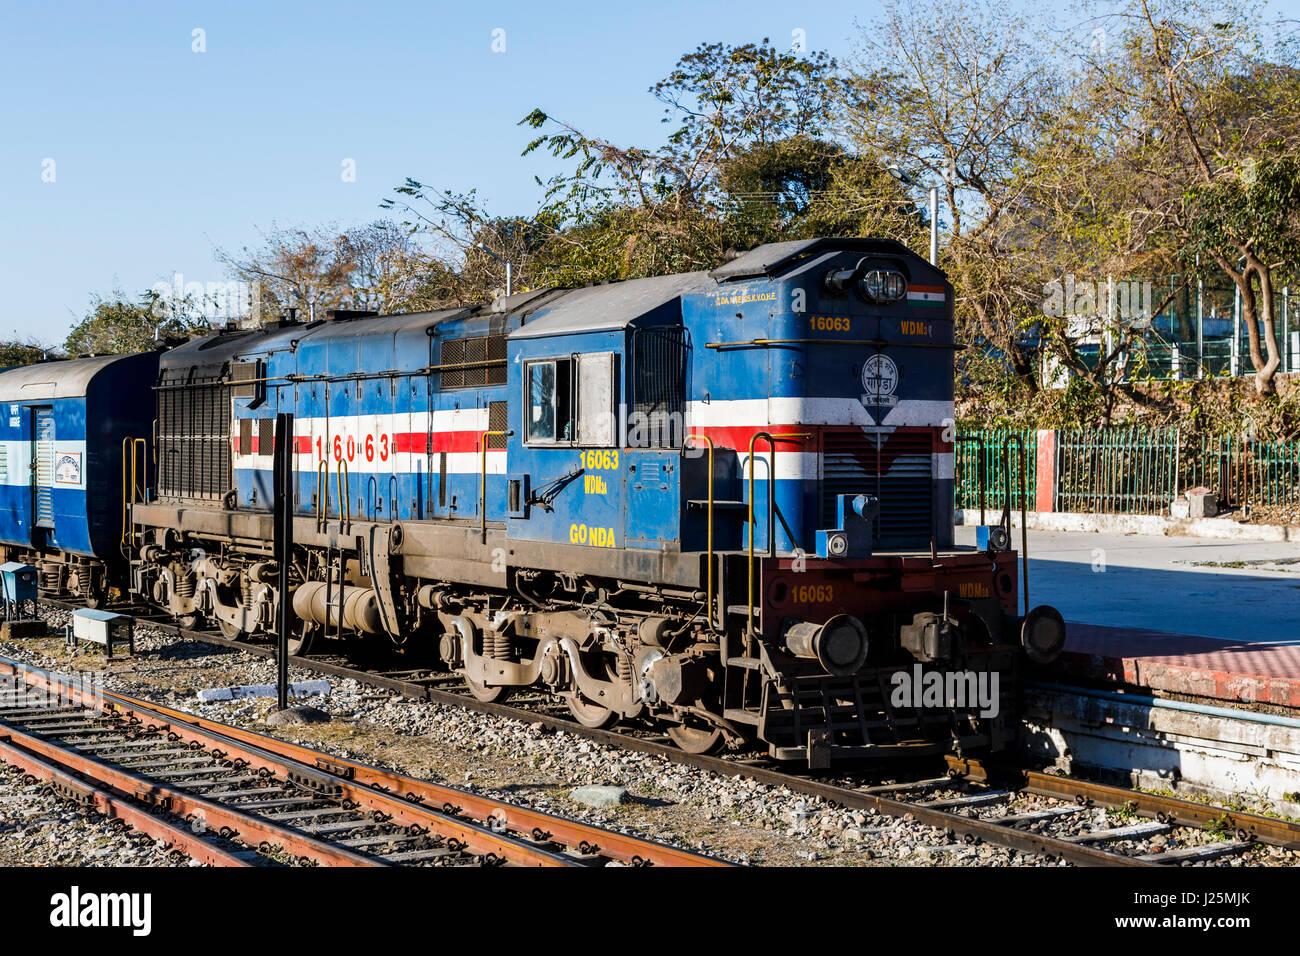 stationary indian railways blue diesel locomotive train engine stock